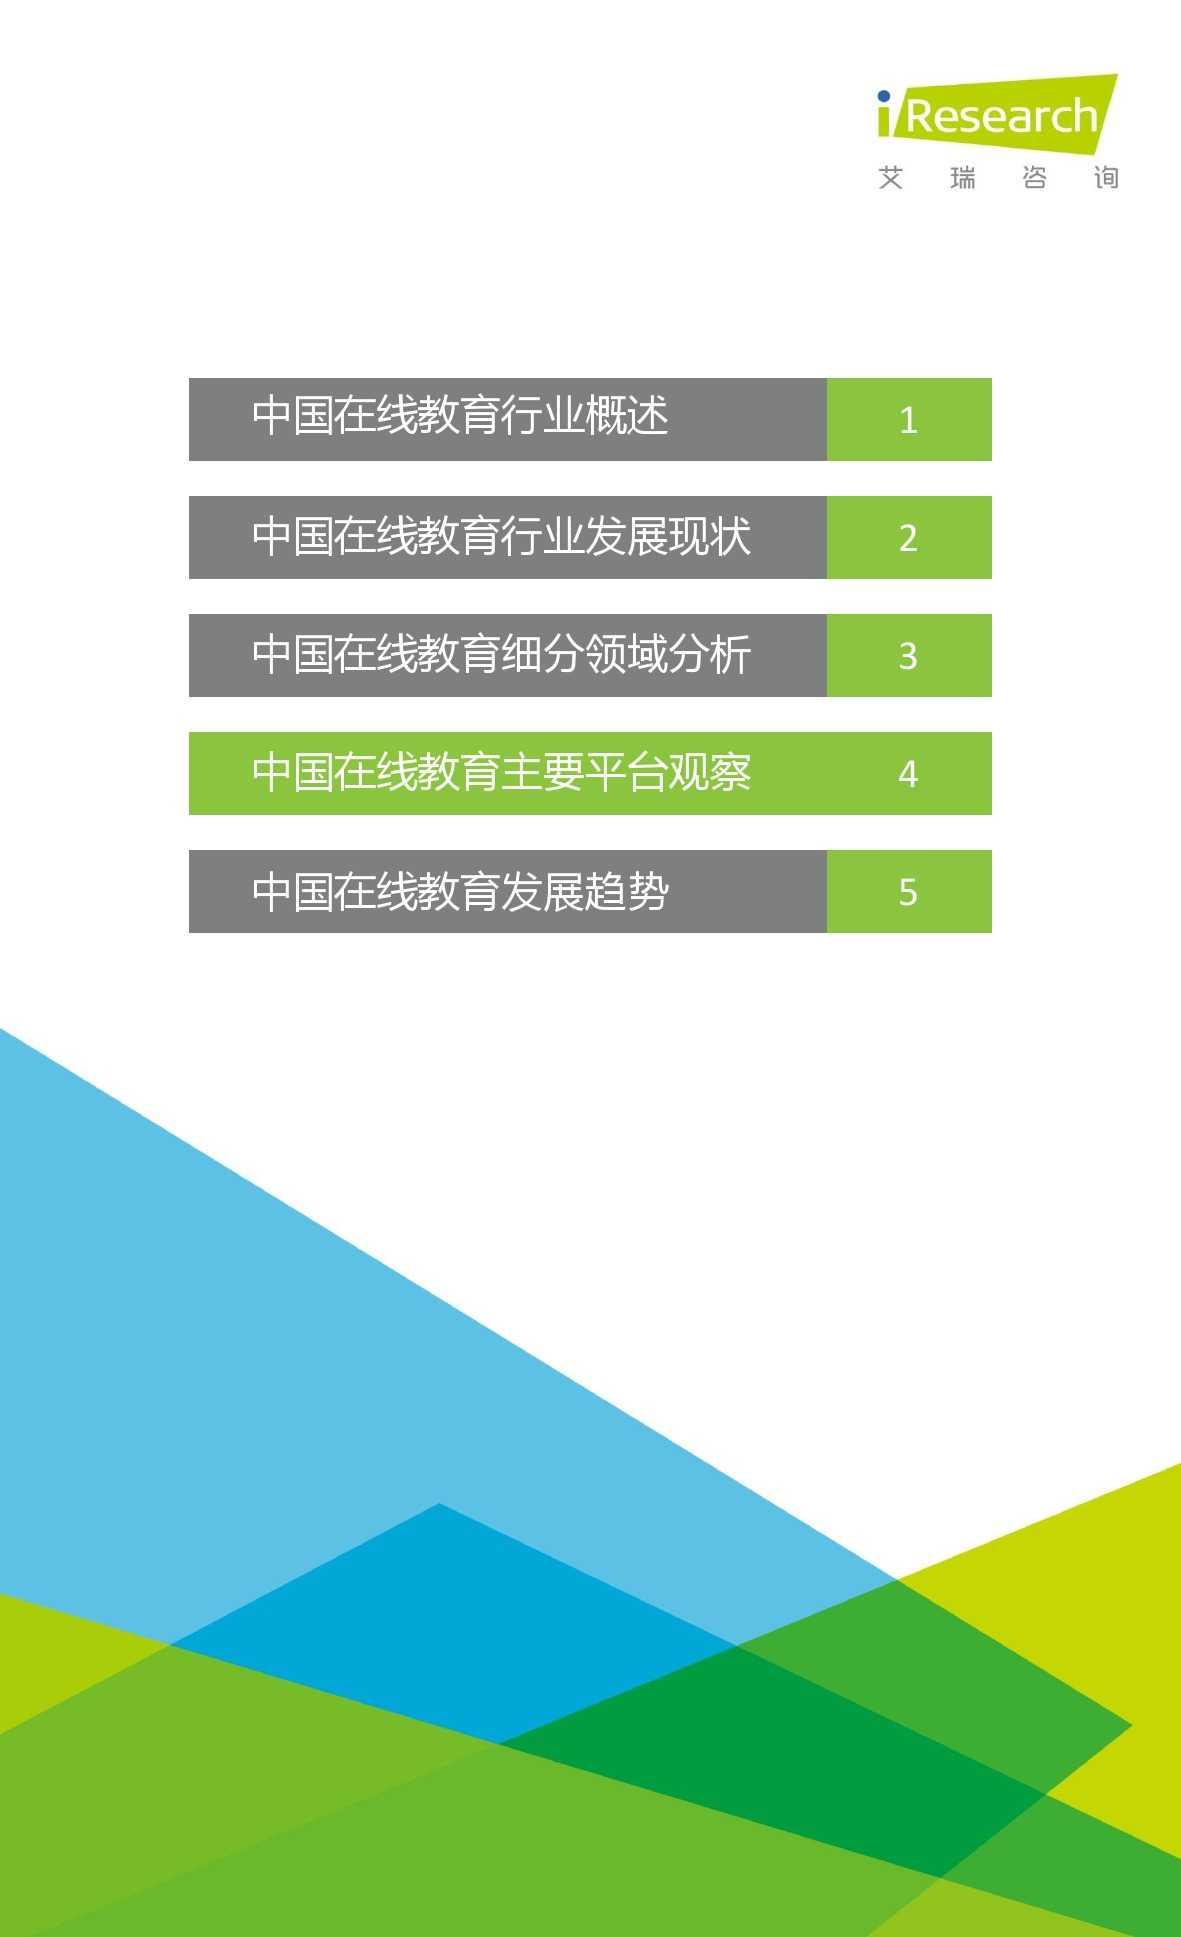 iResearch-2015年中国在线教育平台研究报告_000037